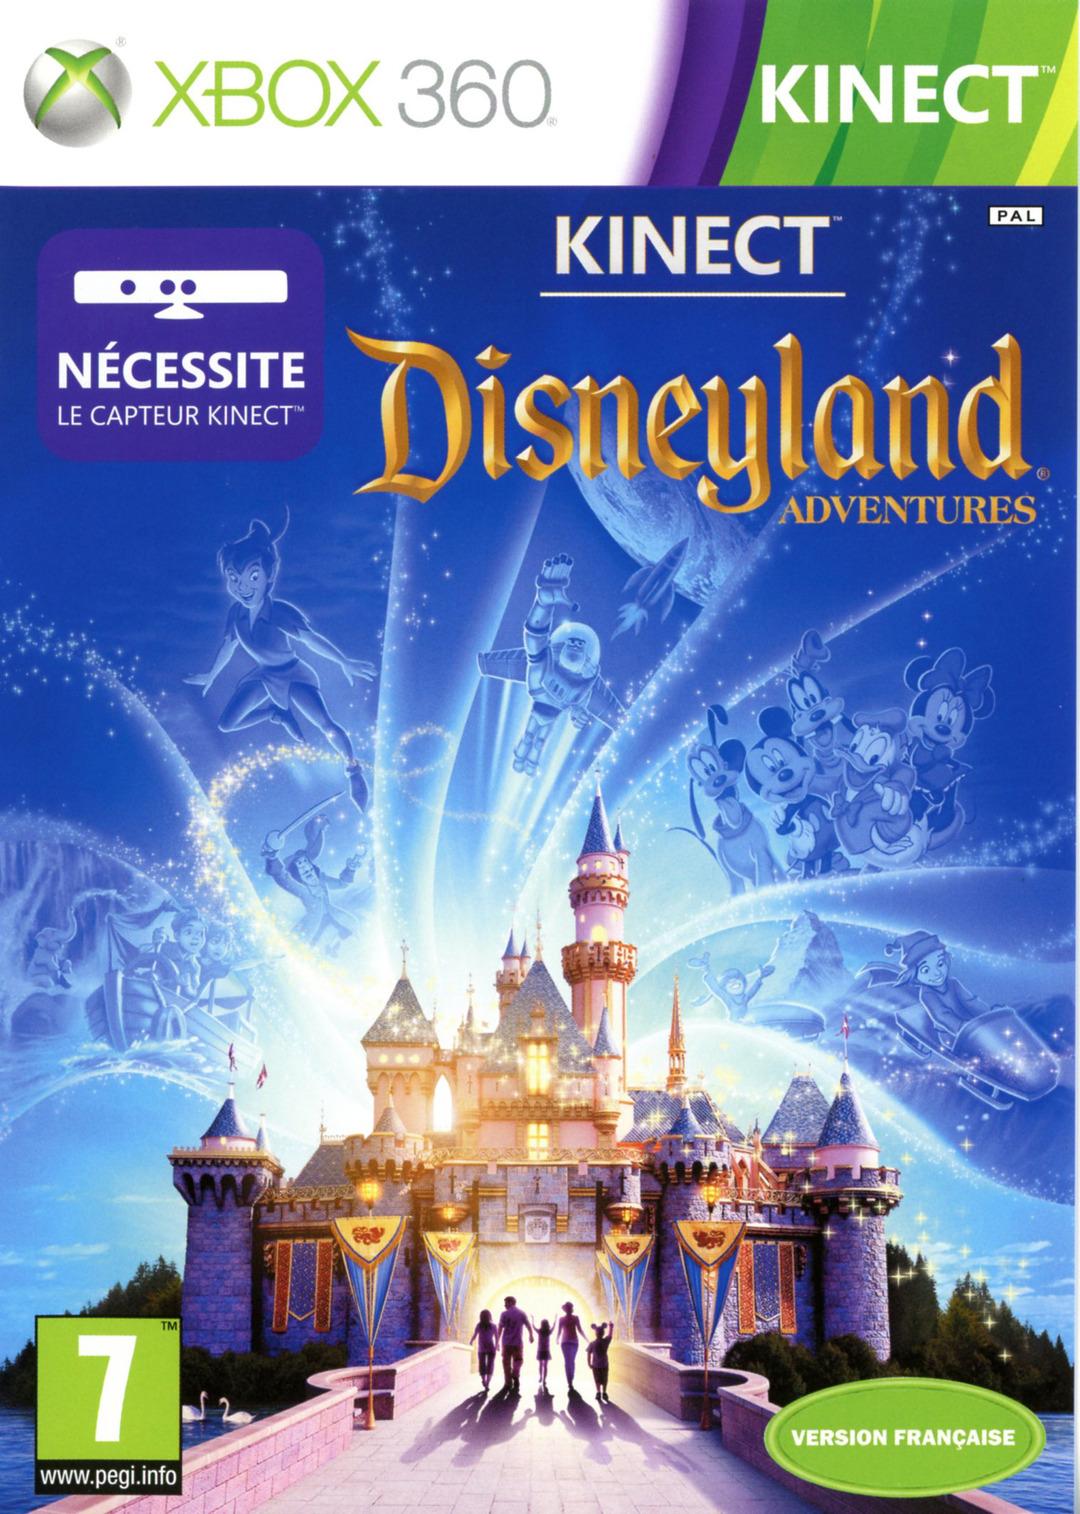 jeuxvideo.com Kinect Disneyland Adventures - Xbox 360 Image 1 sur 112